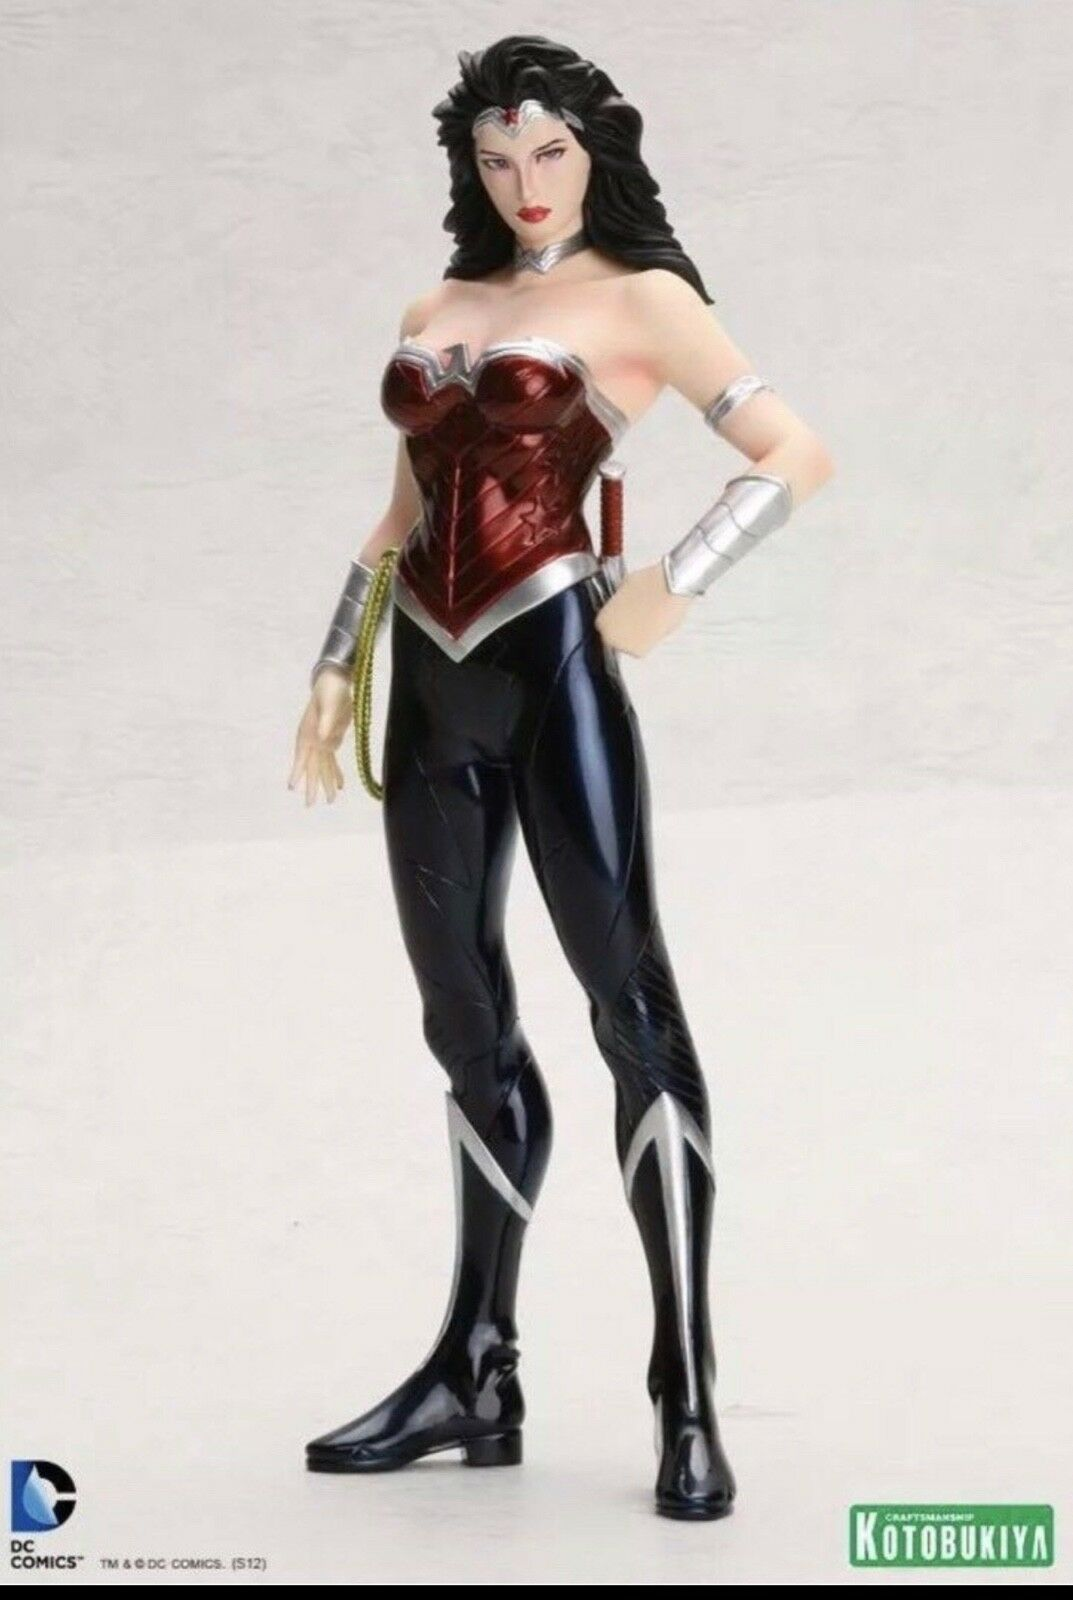 Brand New Sealed Kotobukiya Wonder Woman  DC Comics  New 52 ArtFX Statue figure